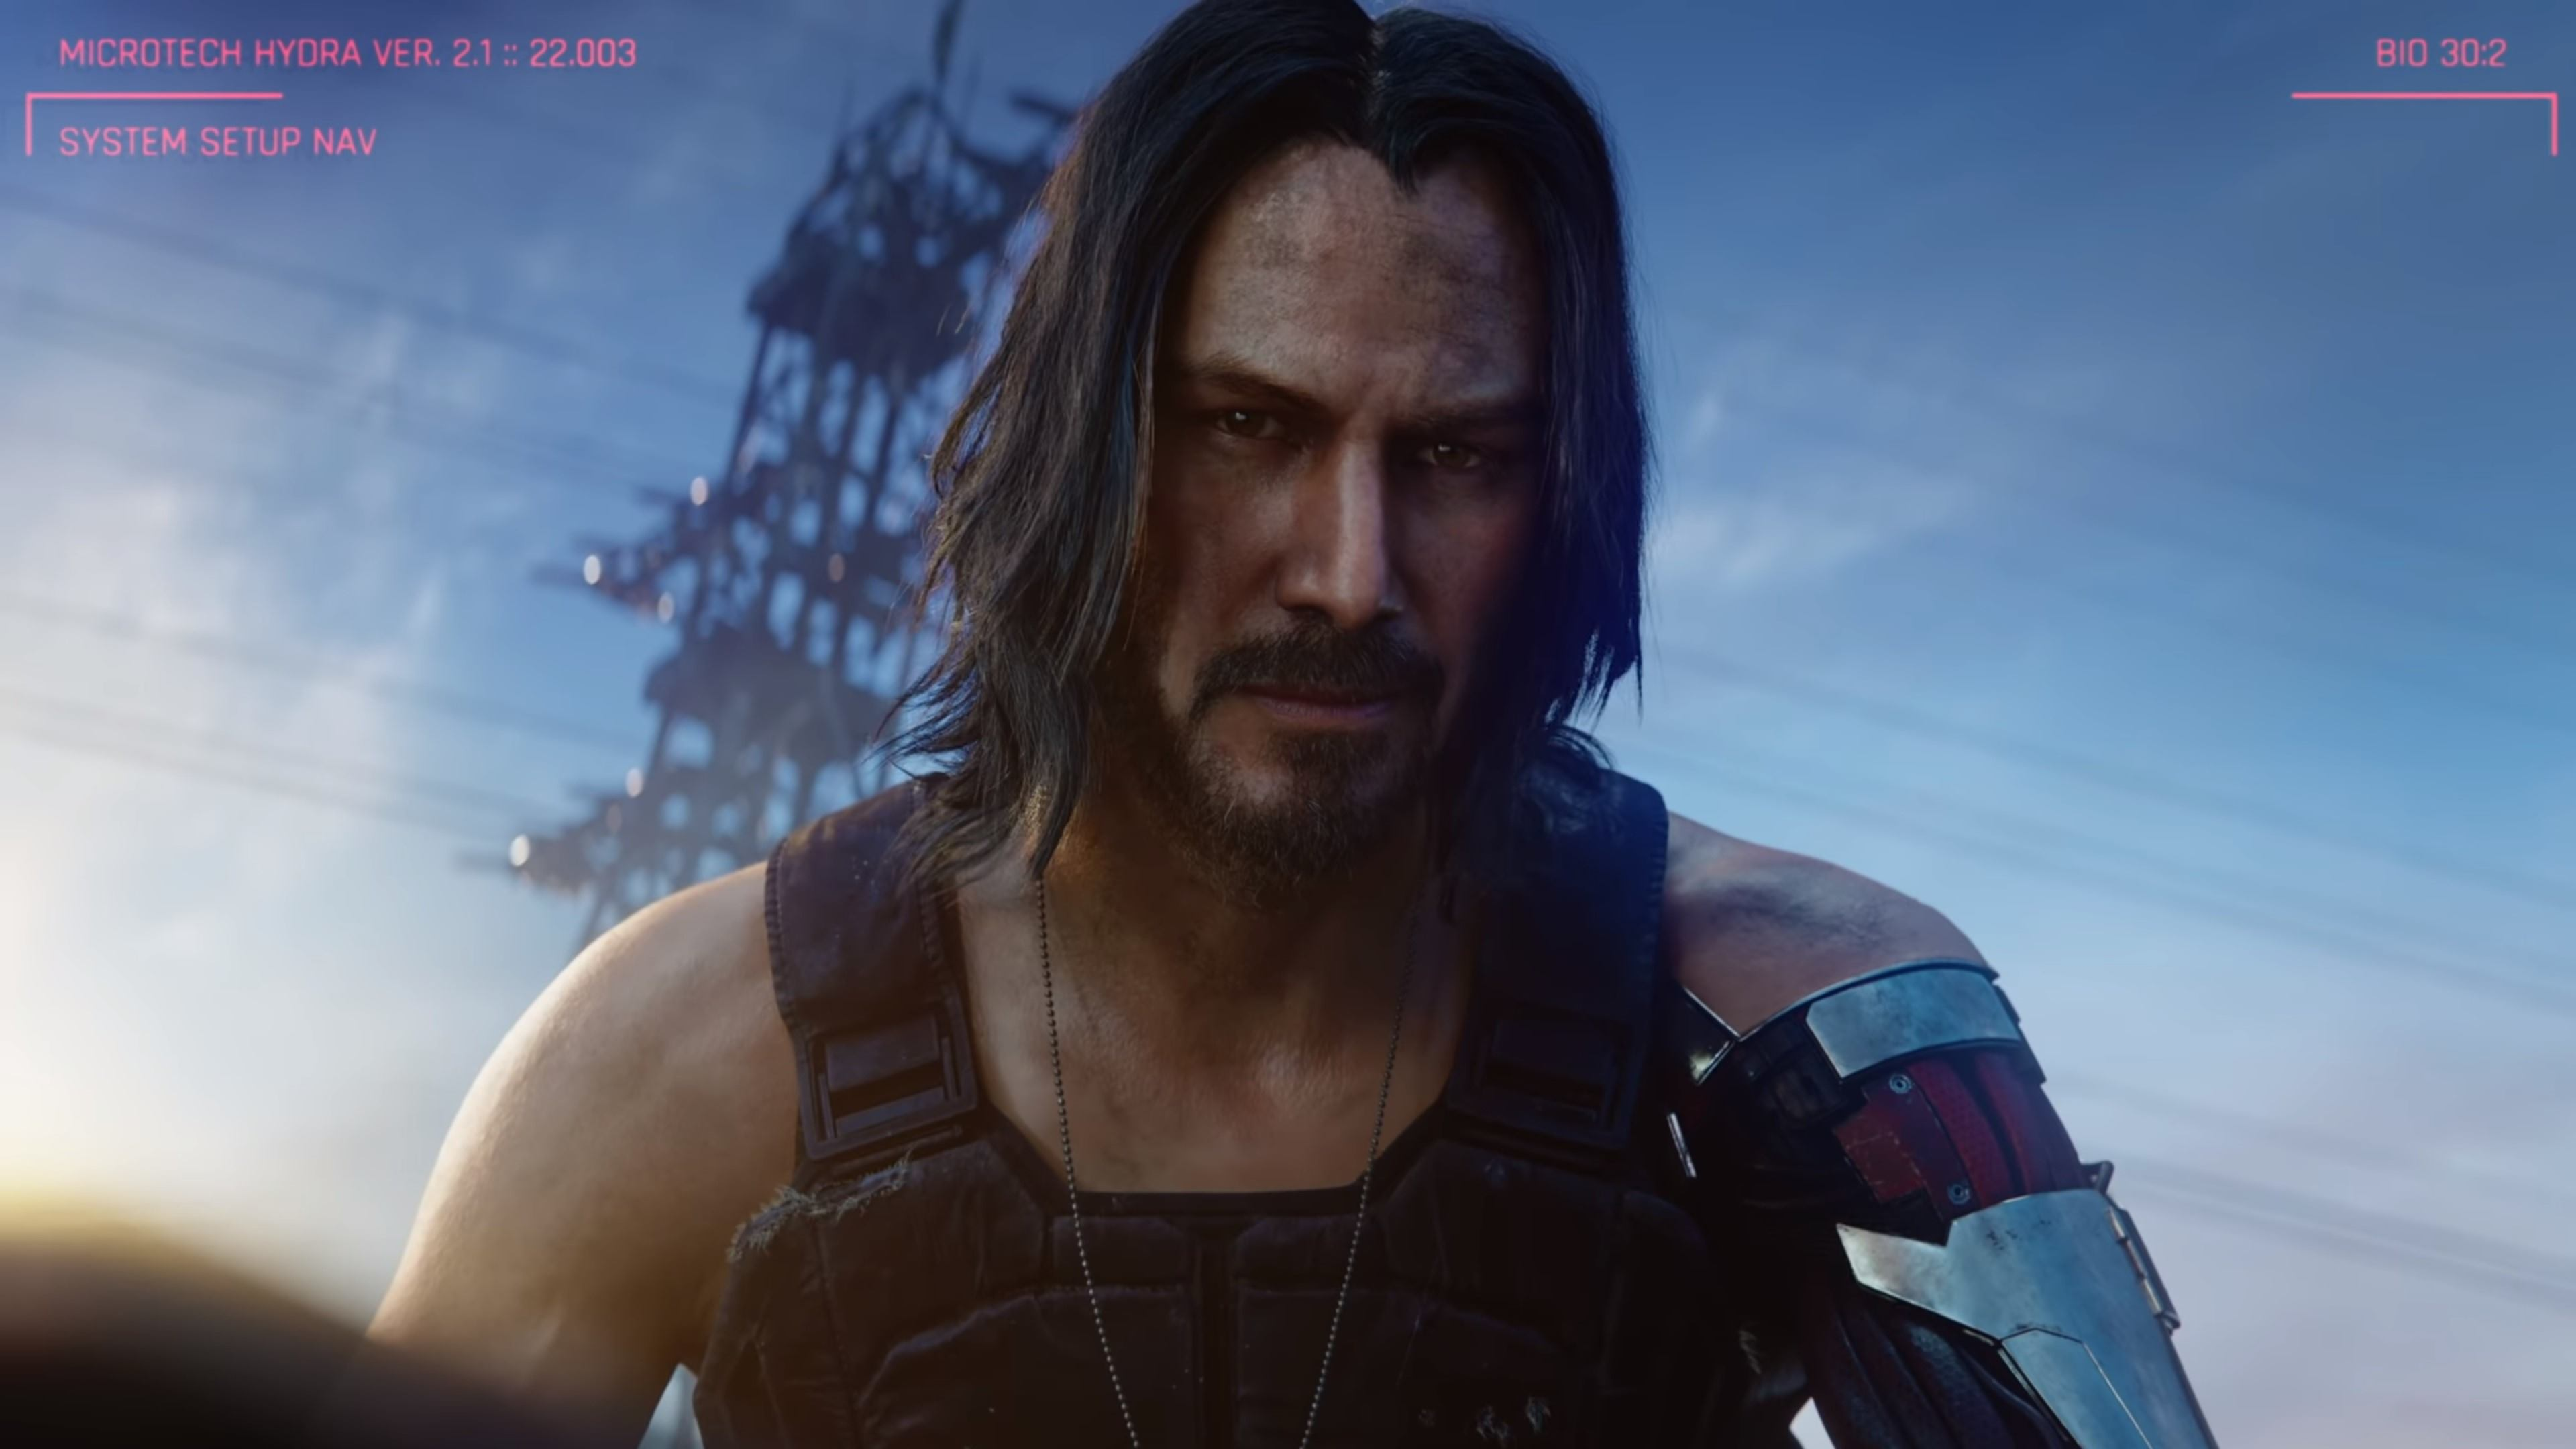 PAX West 2019游戏展即将开催!盘点6大期待爆表的电玩新情报 - 宅男圈